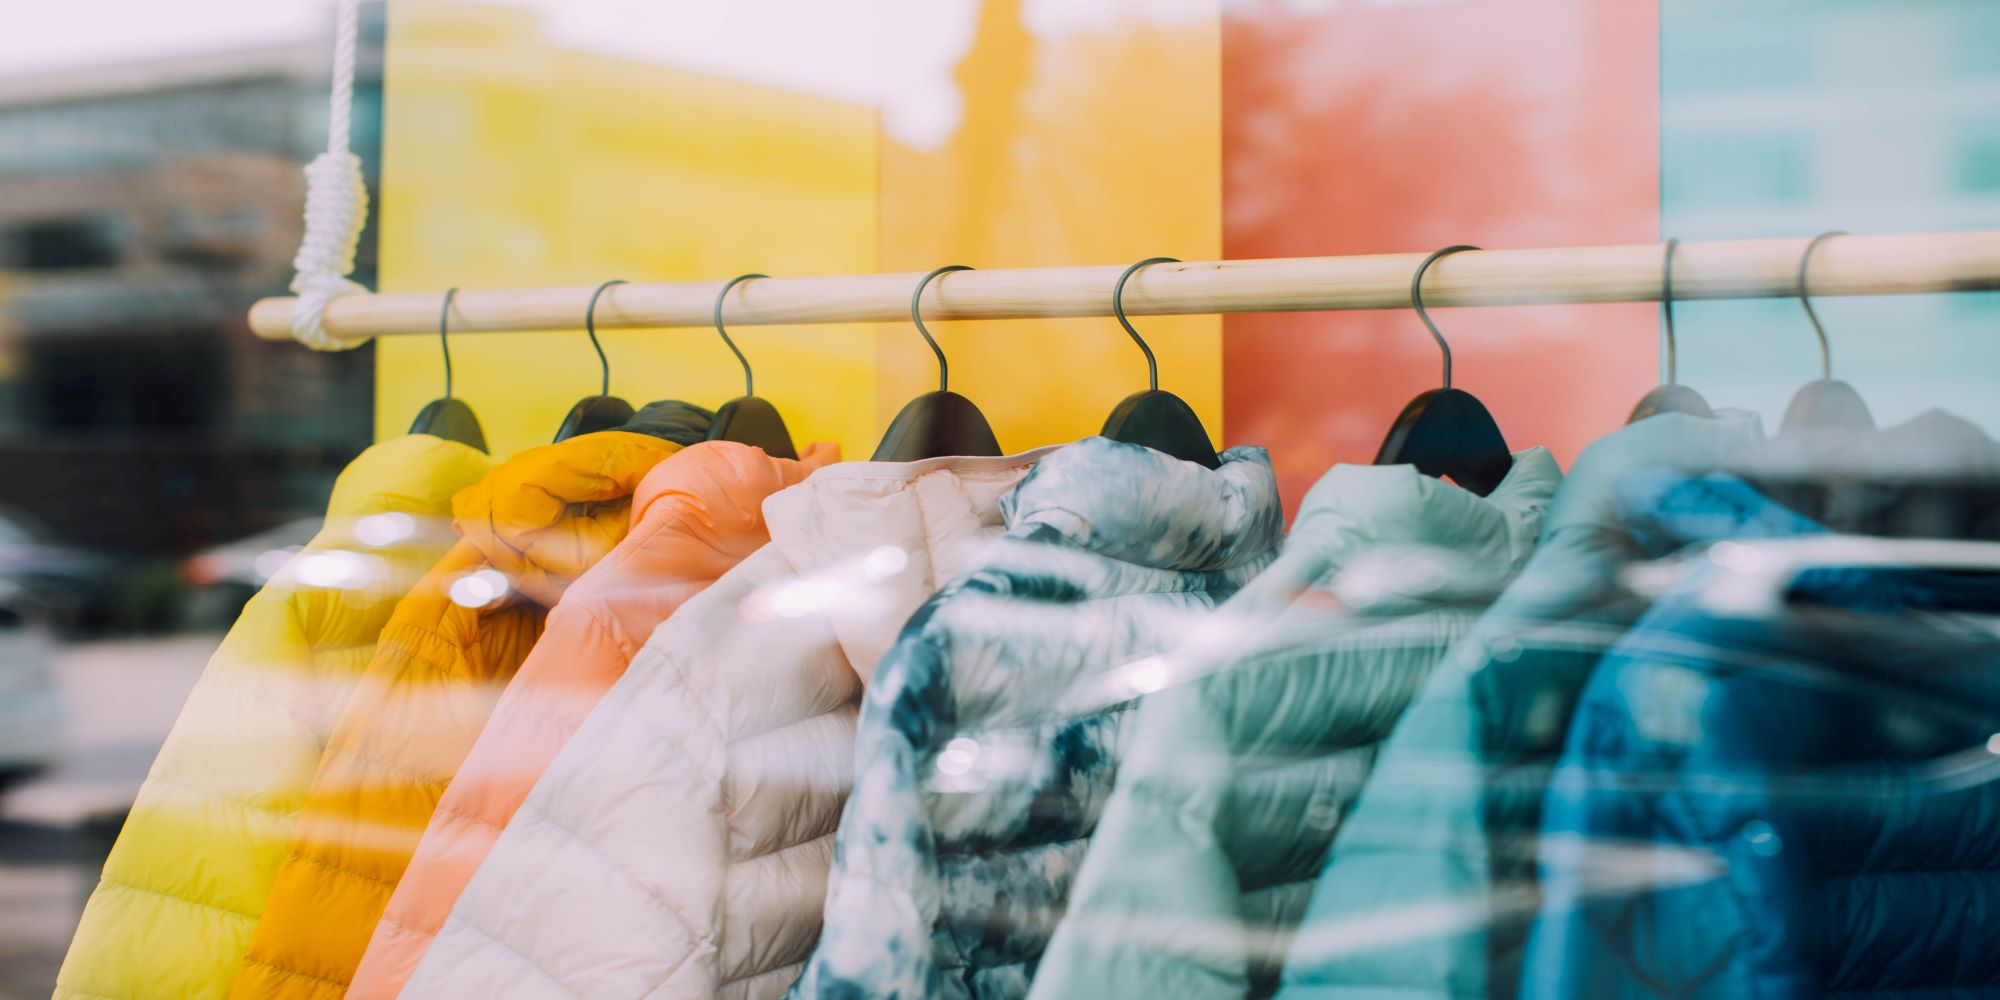 International Marketing News: Top Global Brands Revolutionising In-Store Experiences